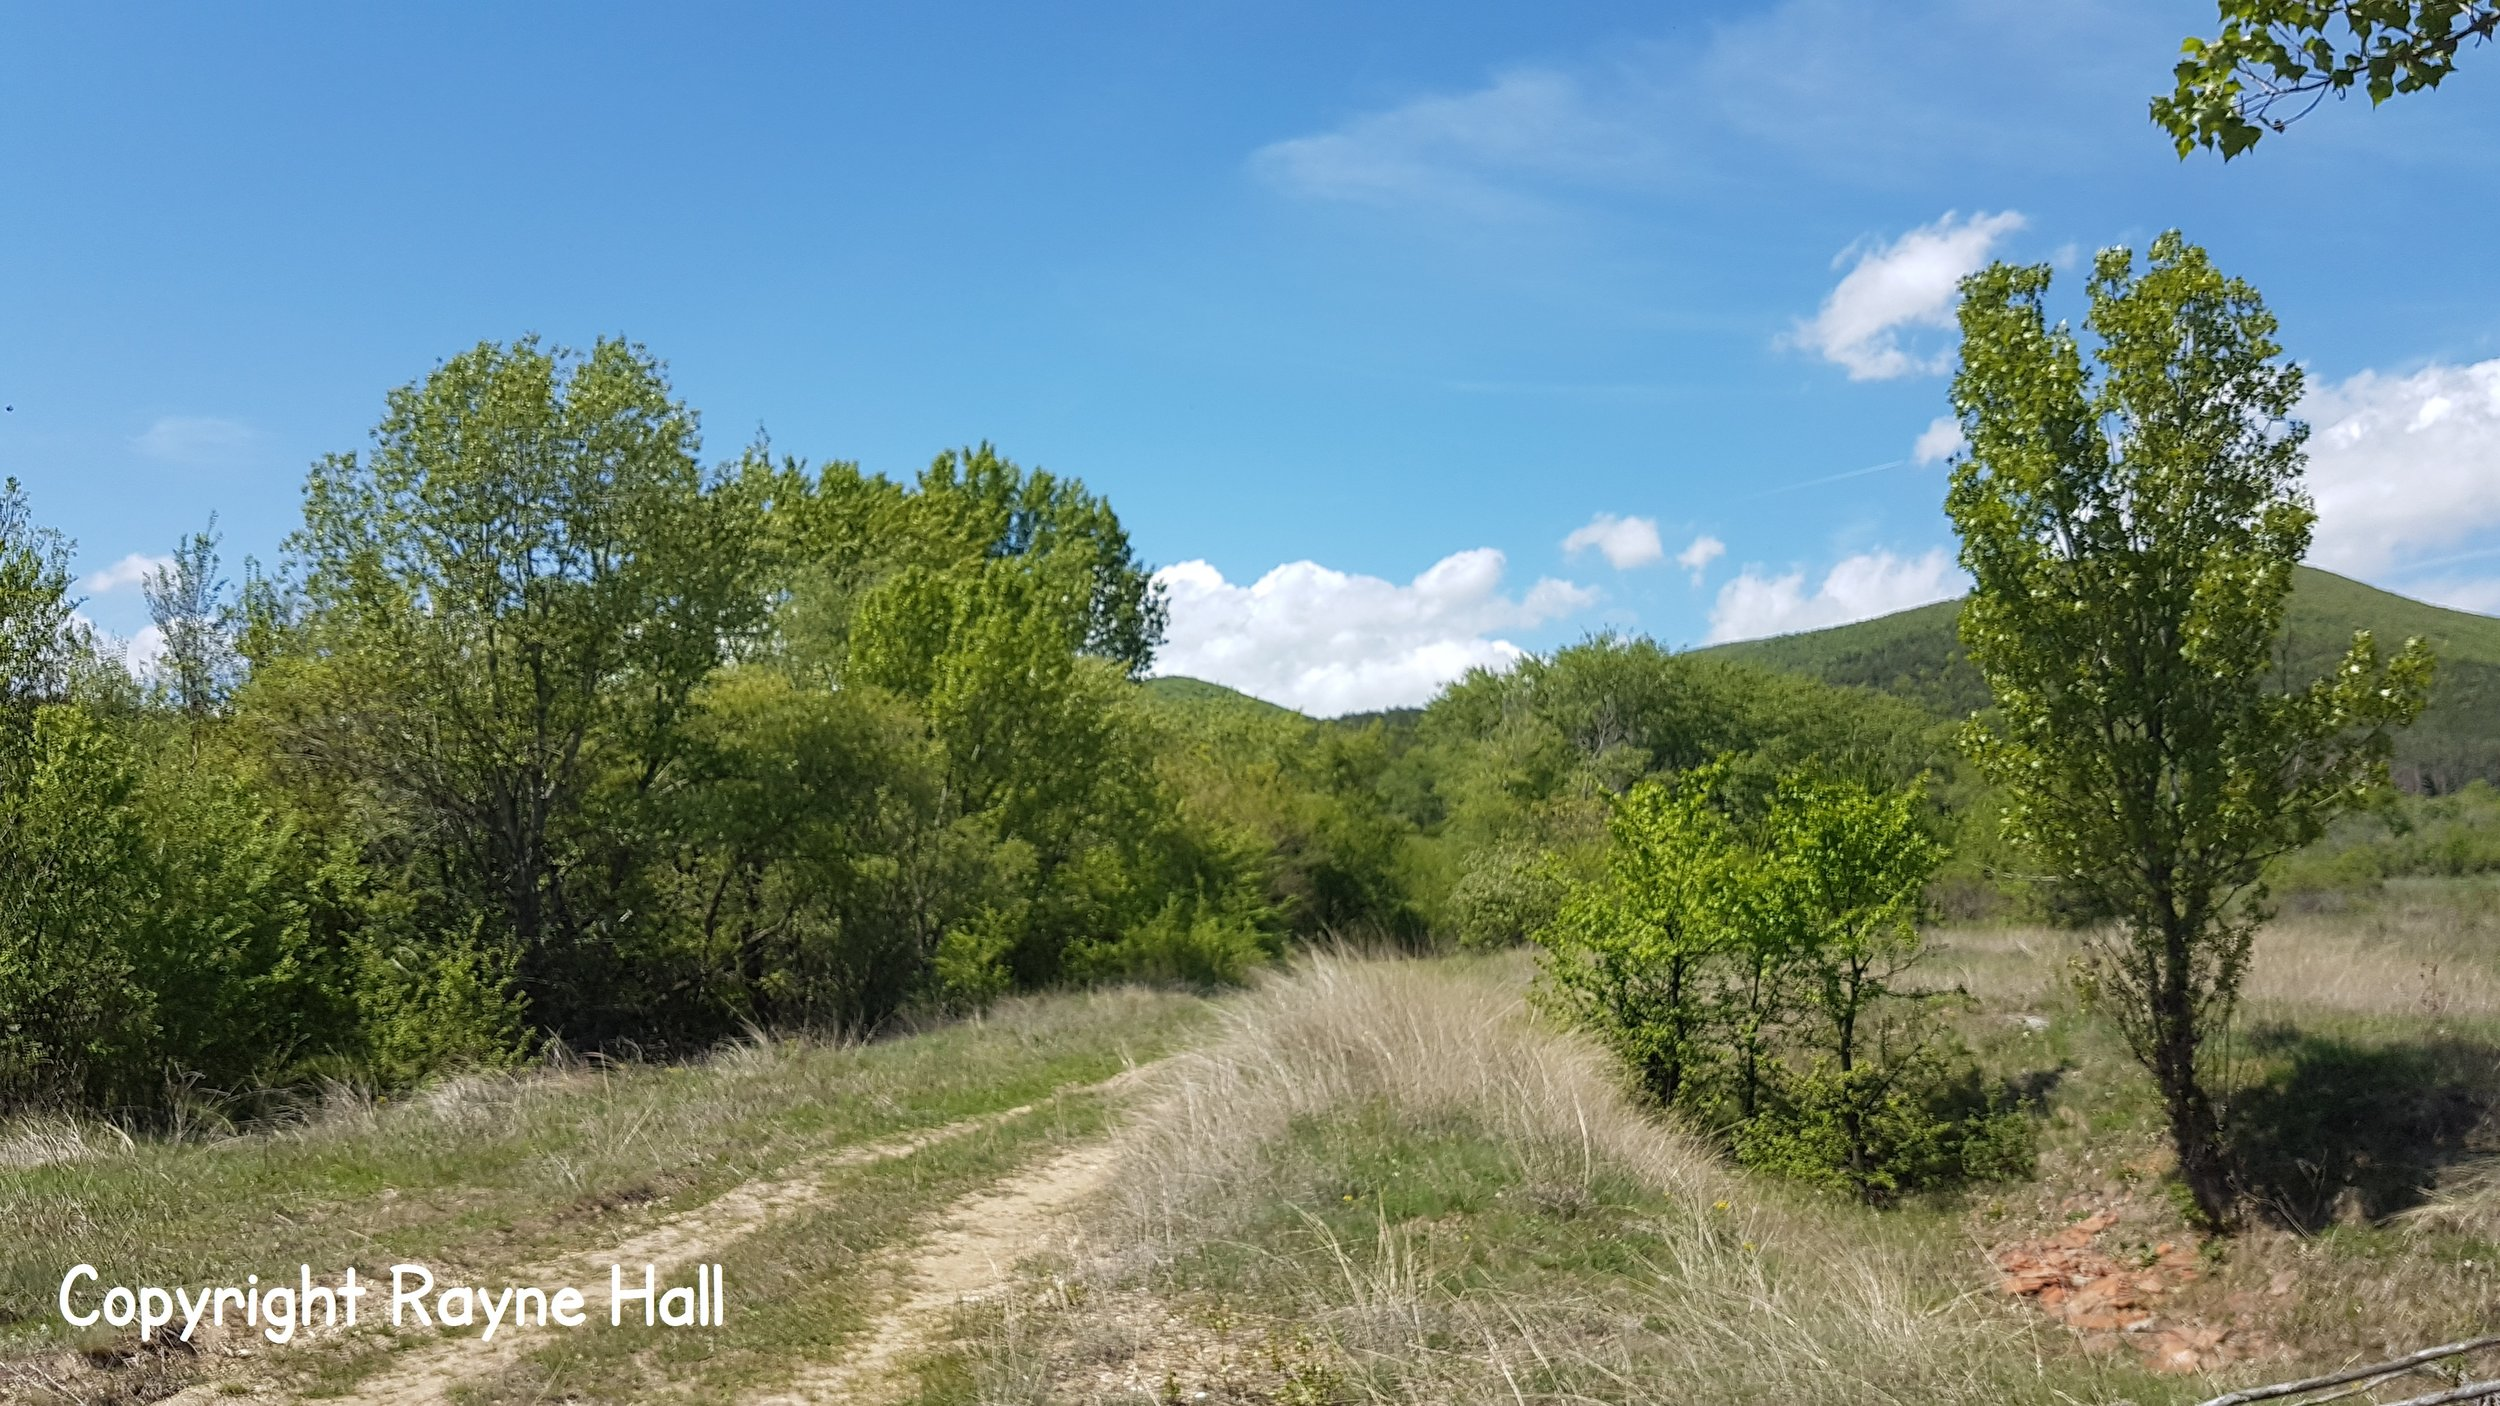 Rayne-Hall-Bulgaria-copyright (6).jpg